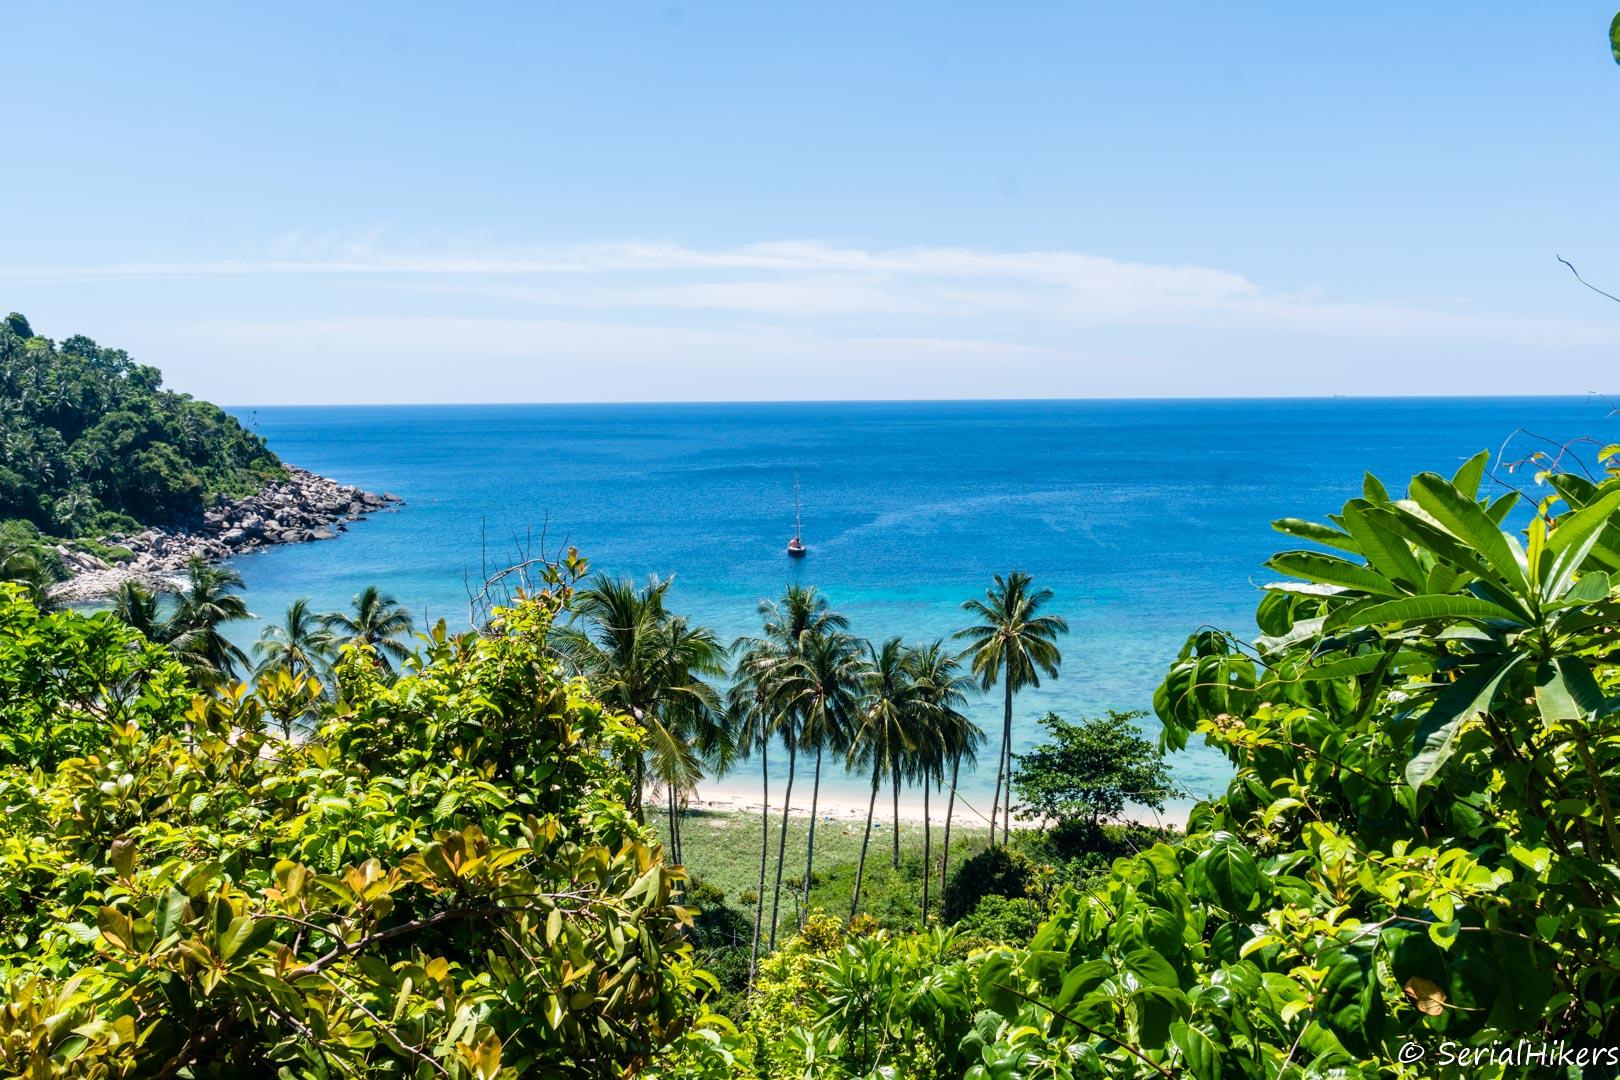 SerialHikers stop autostop world monde tour hitchhiking aventure adventure alternative travel voyage sans avion no fly malaisie malaysia ile island Aur